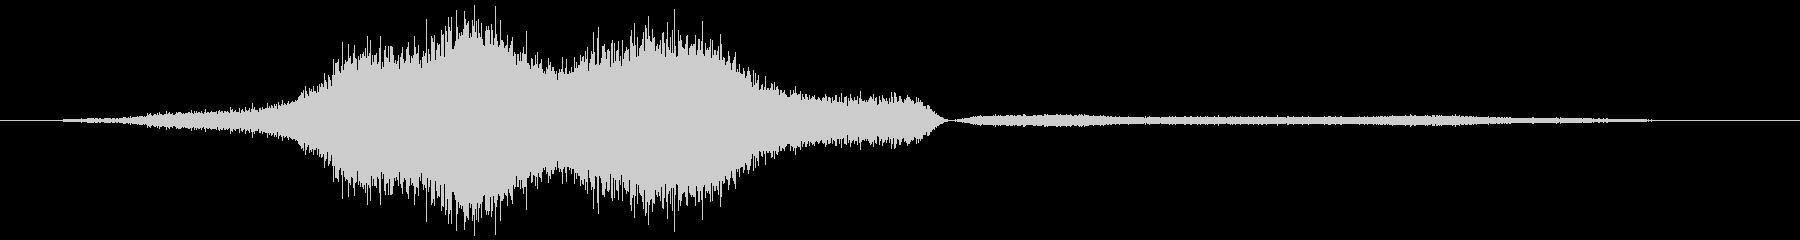 Python、ビルマのヒス。息を吸...の未再生の波形